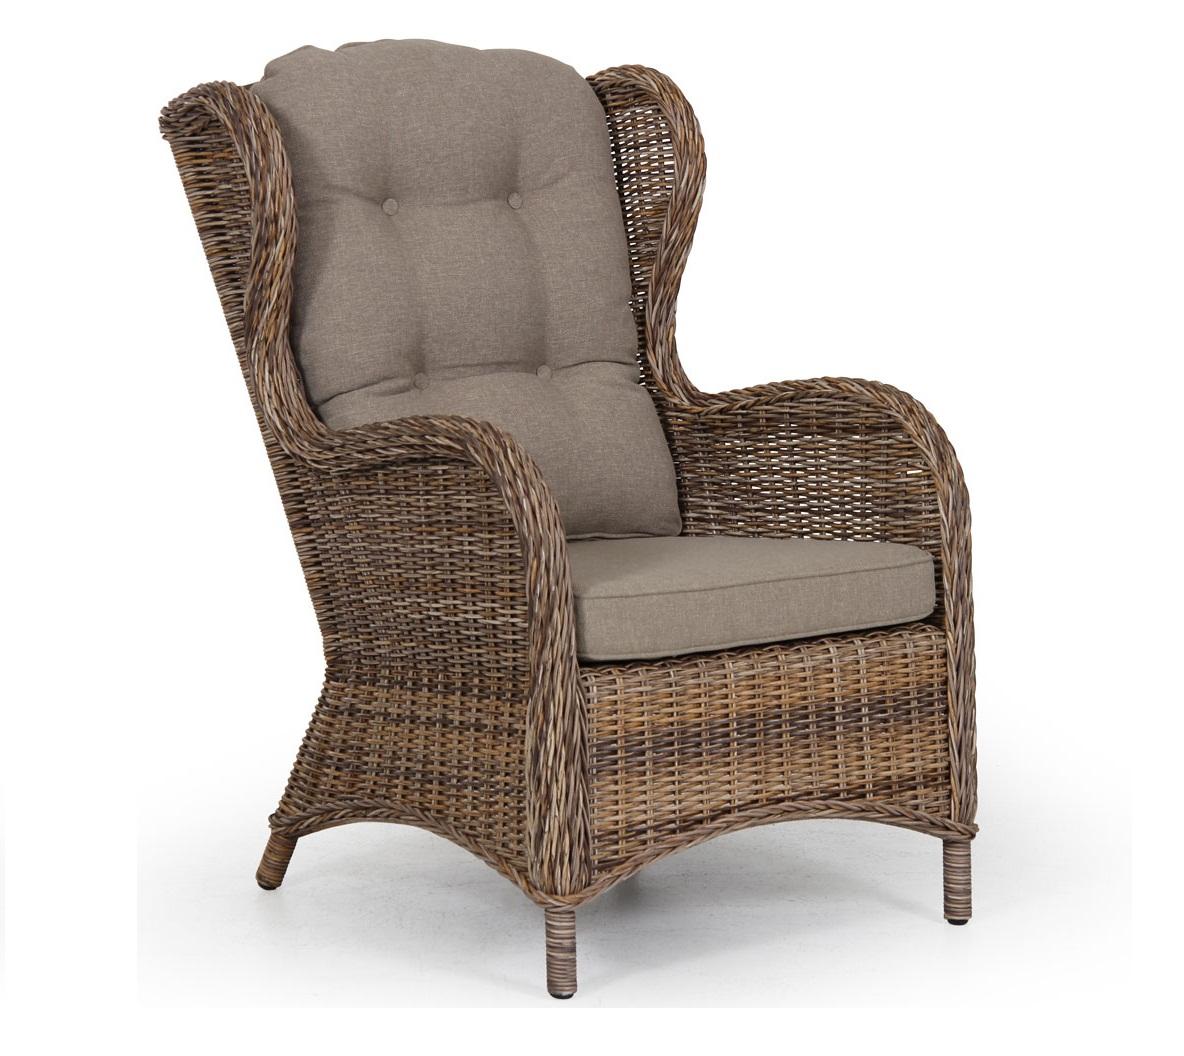 Плетеное кресло Evita brown